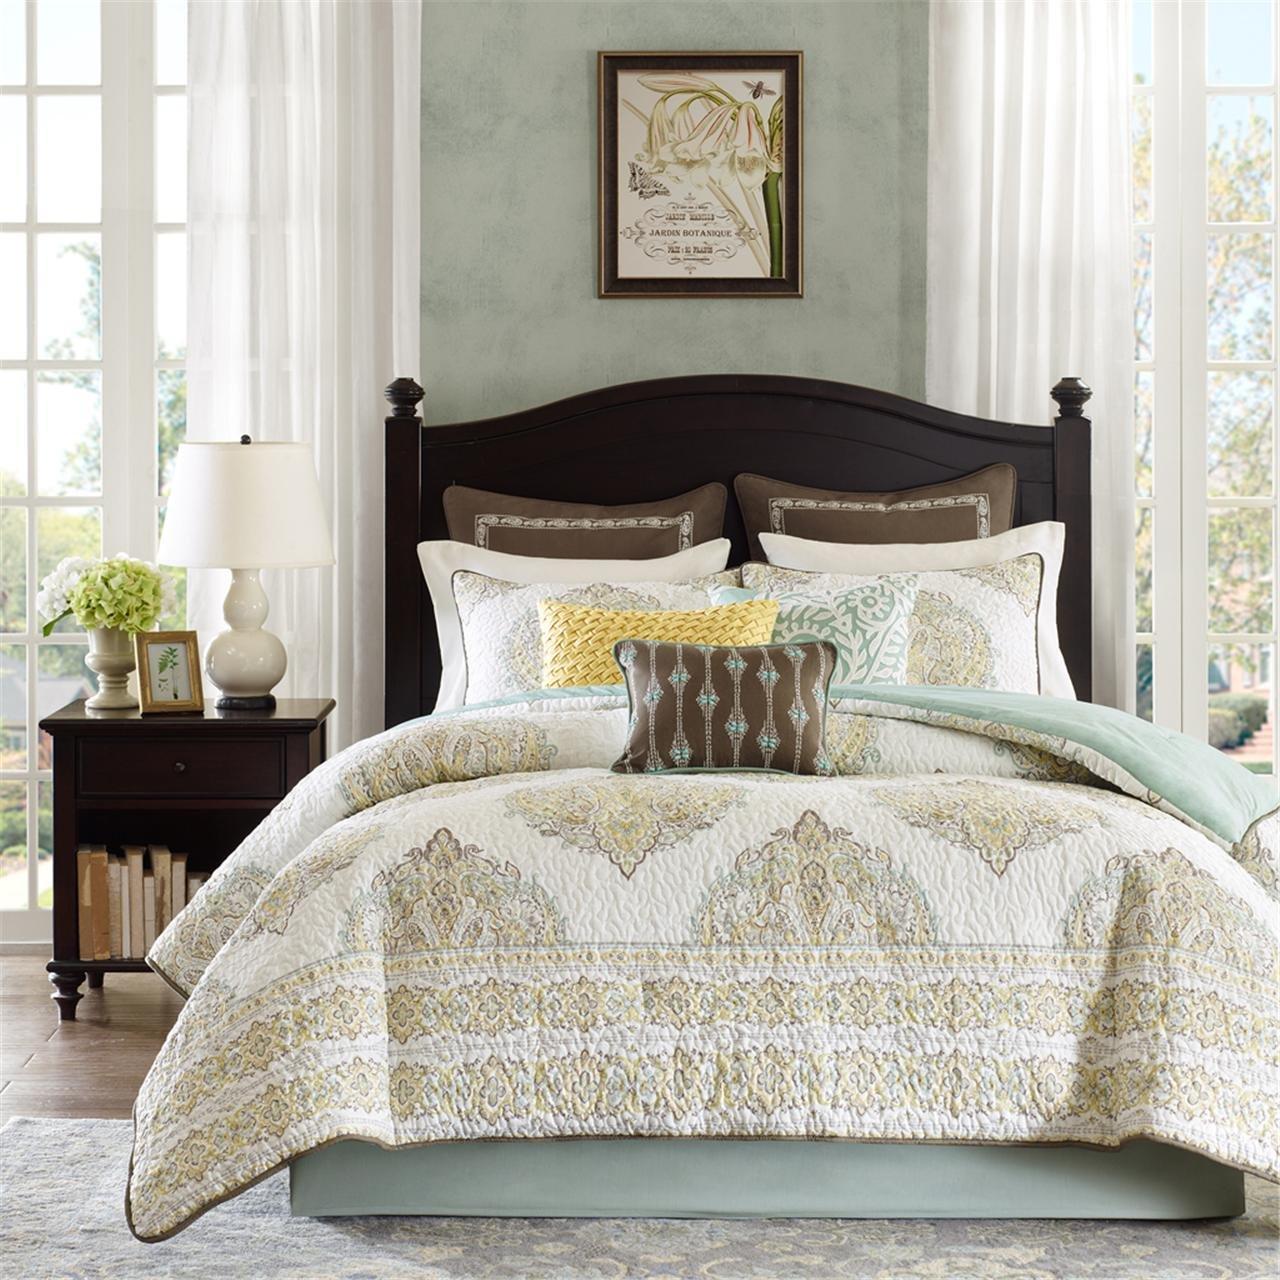 Exceptional Amazon.com: Harbor House Miramar 4 Piece Comforter Set, Cal King,  Multicolor: Home U0026 Kitchen